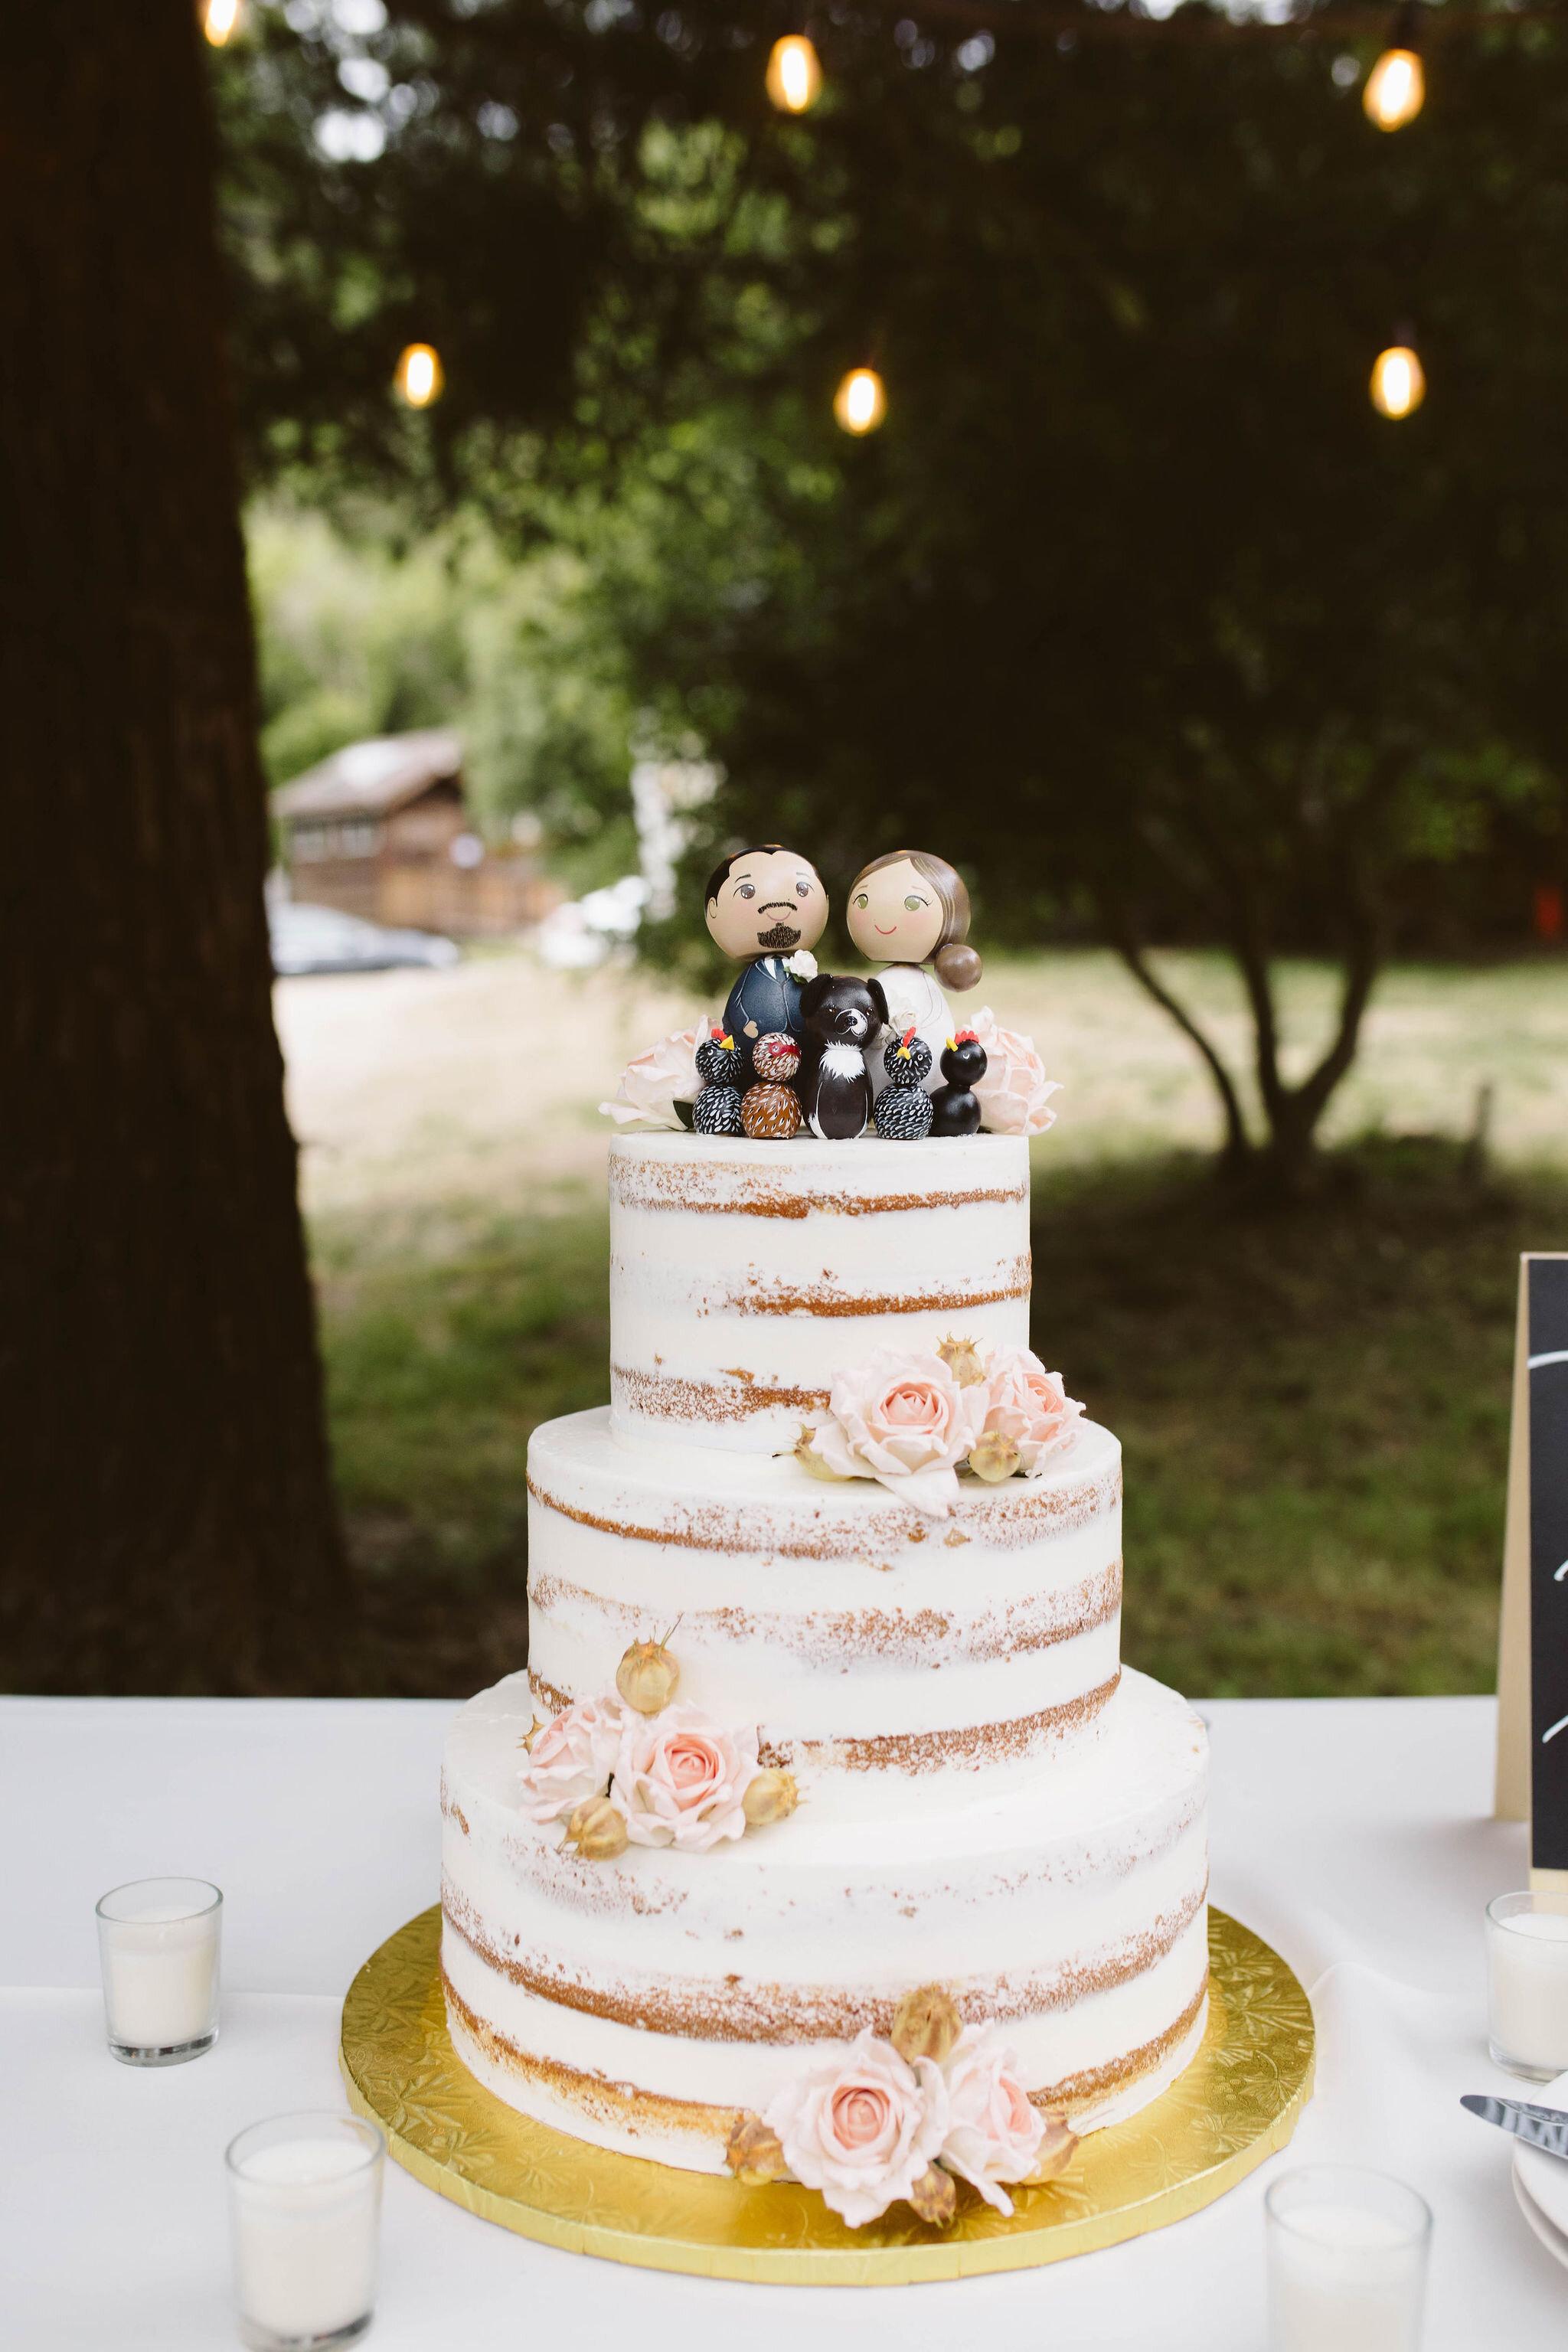 Venture-Retreat-Center-Wedding-Pescadero-Sat-Aaron-Pritam-The-Shalom-Imaginative-651.jpg